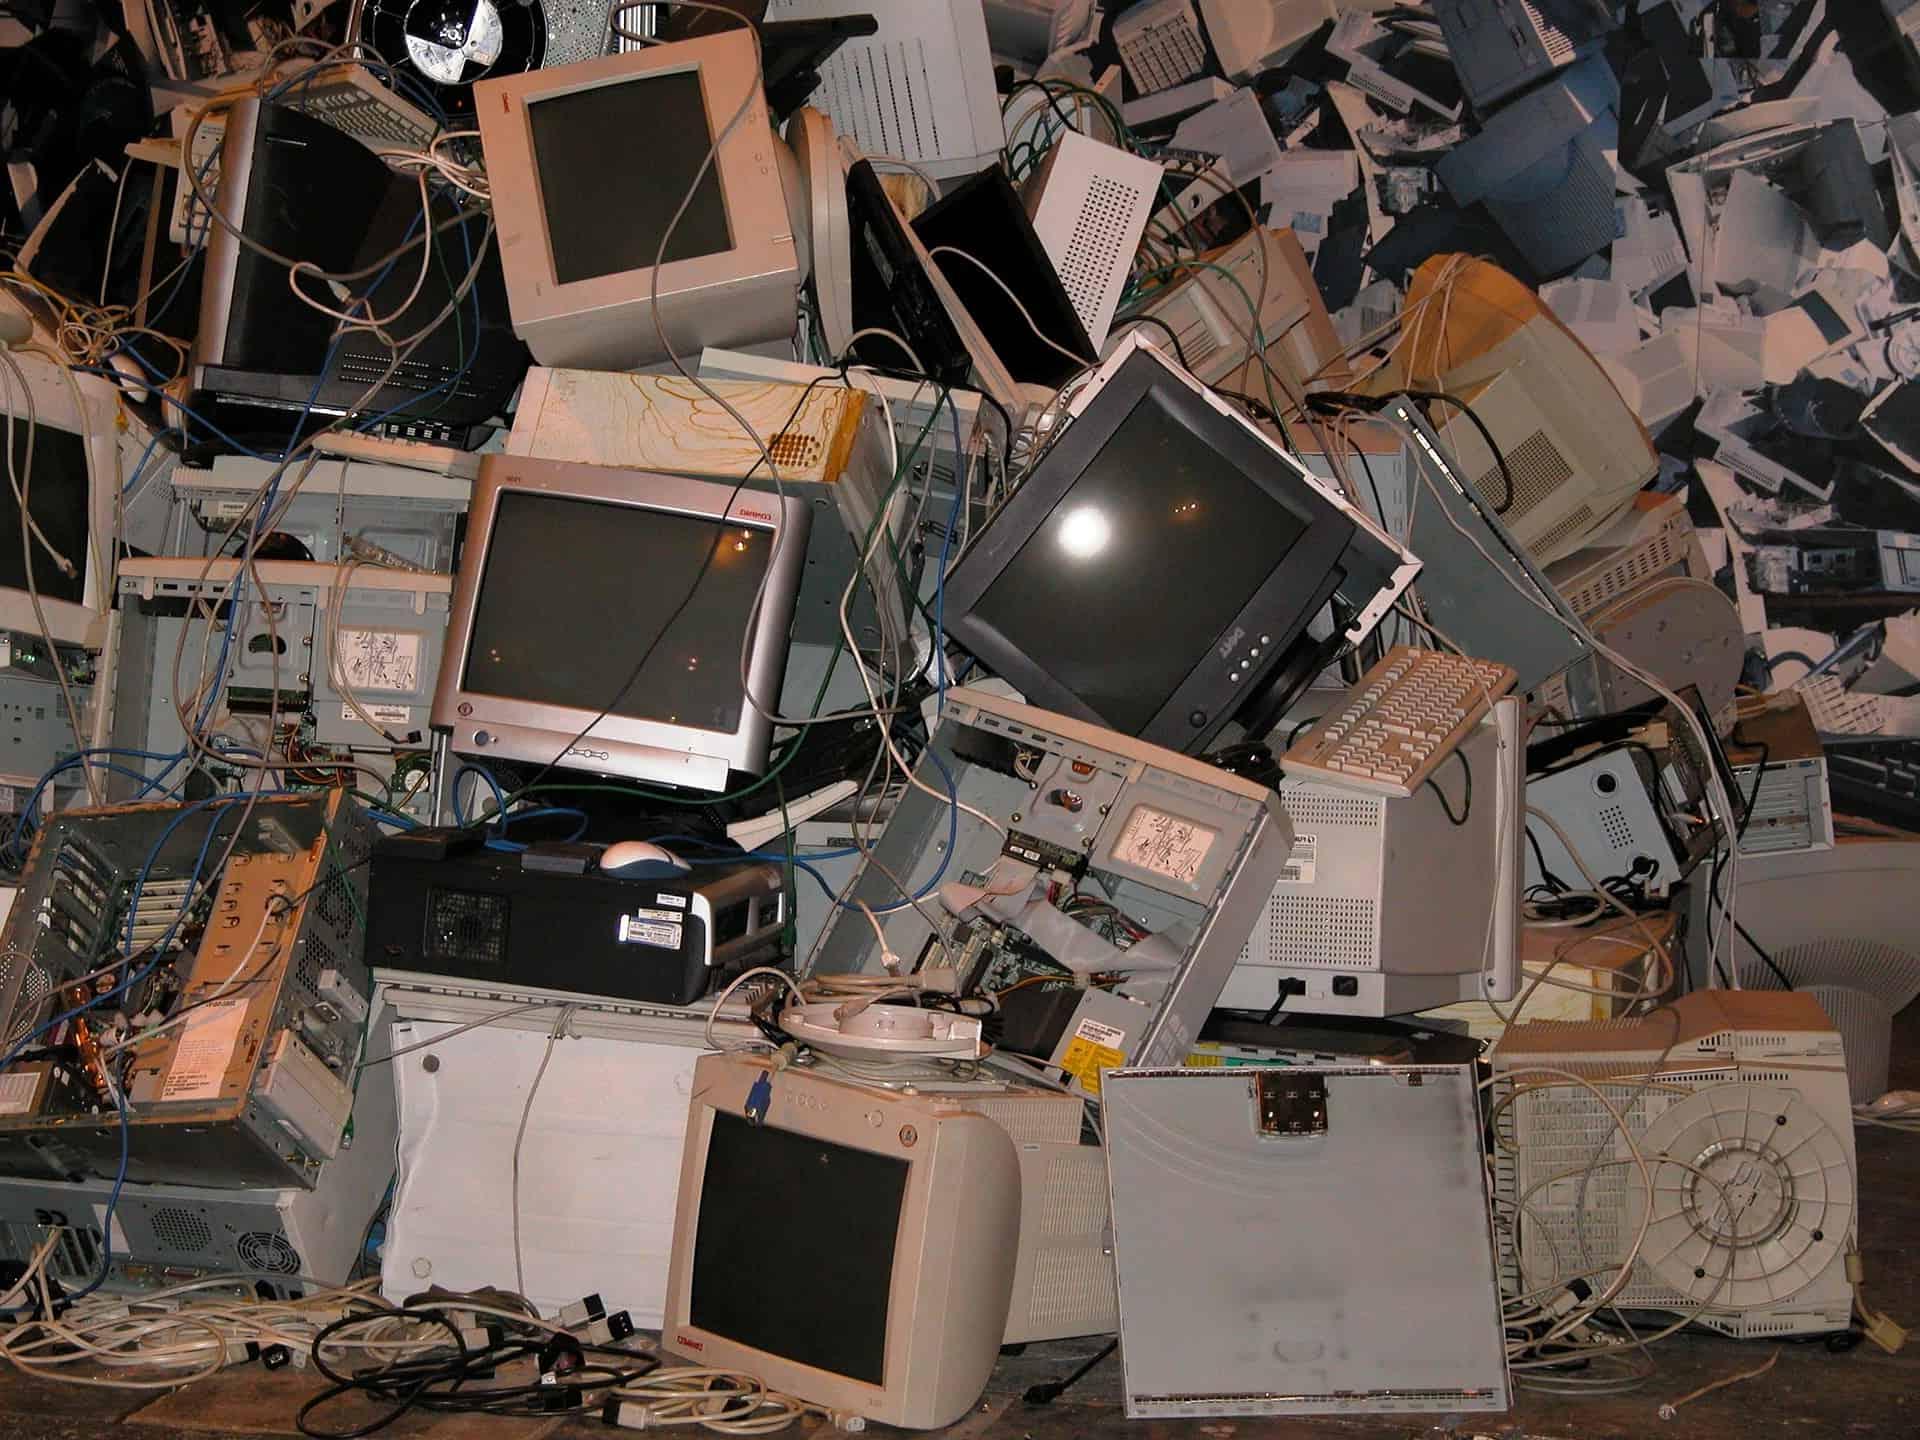 Recupero e lo smaltimento RAEE gratuito con eMondoTech